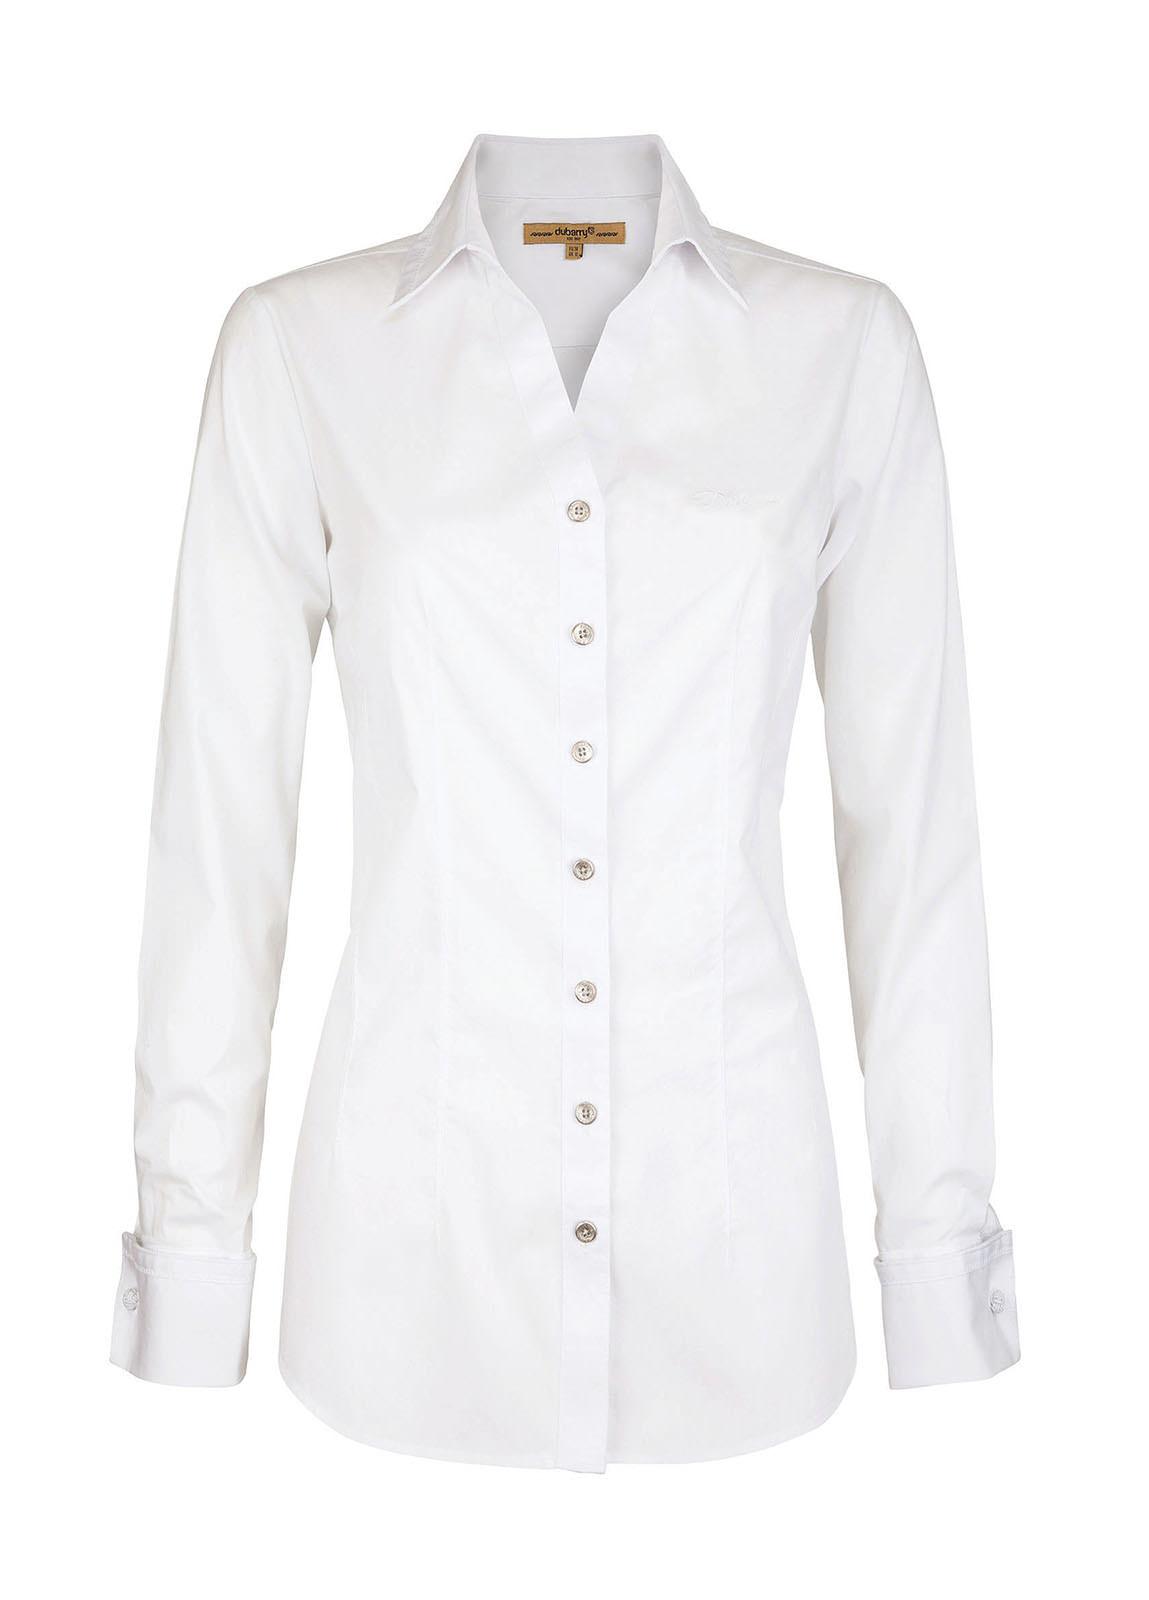 Lily Ladies Shirt - White